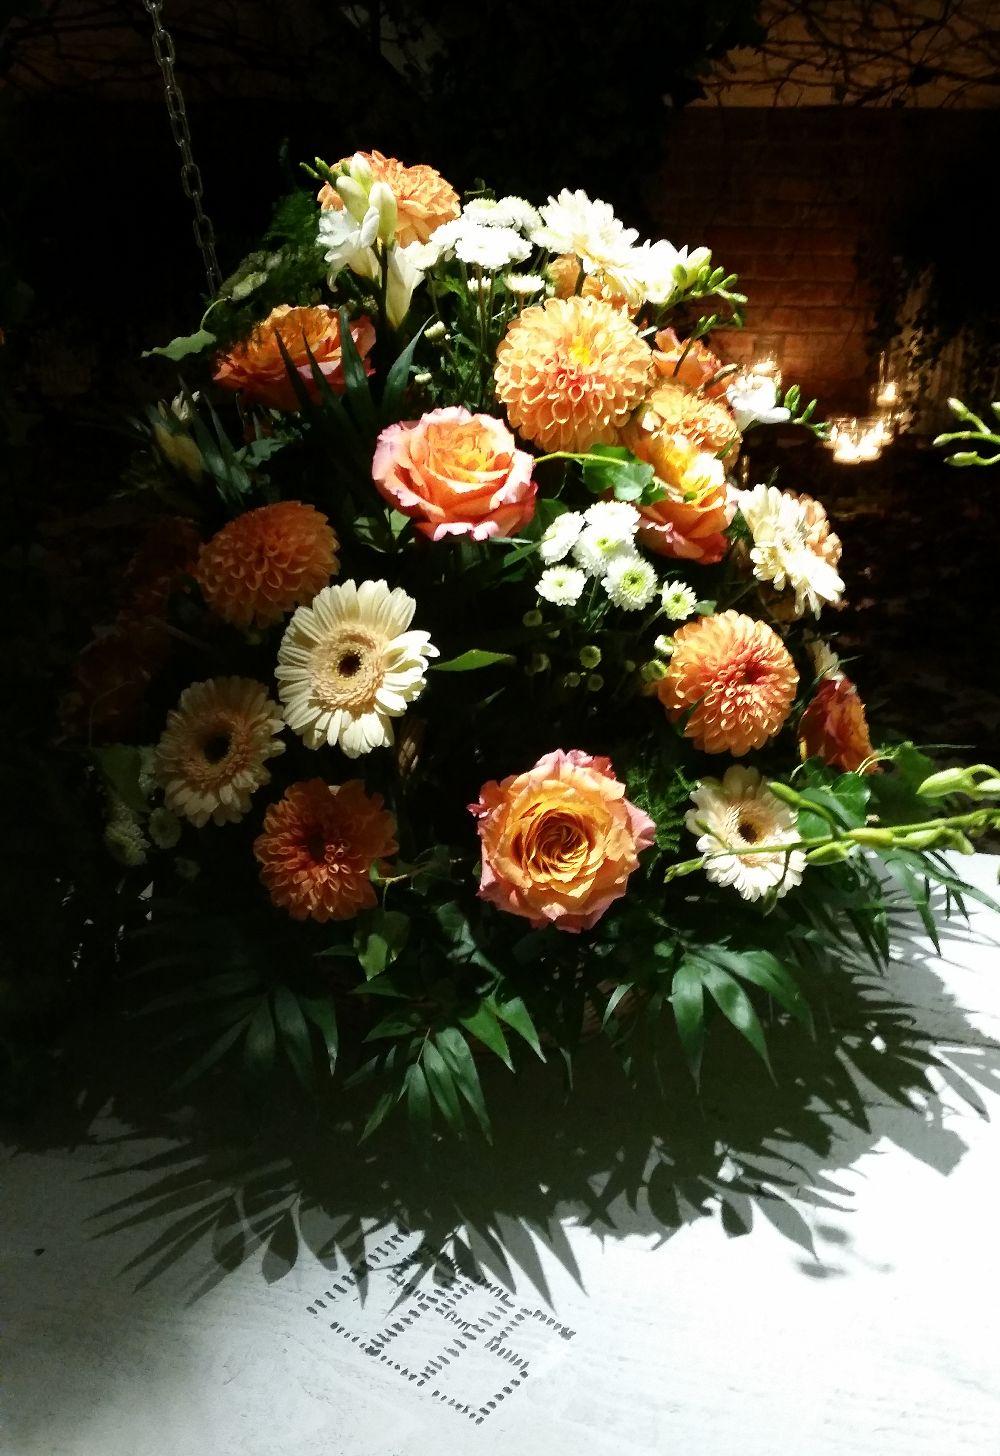 adelaparvu.com despre 45 de ani aniversare Floraria Iris, design floral Nicu Bocancea (6)